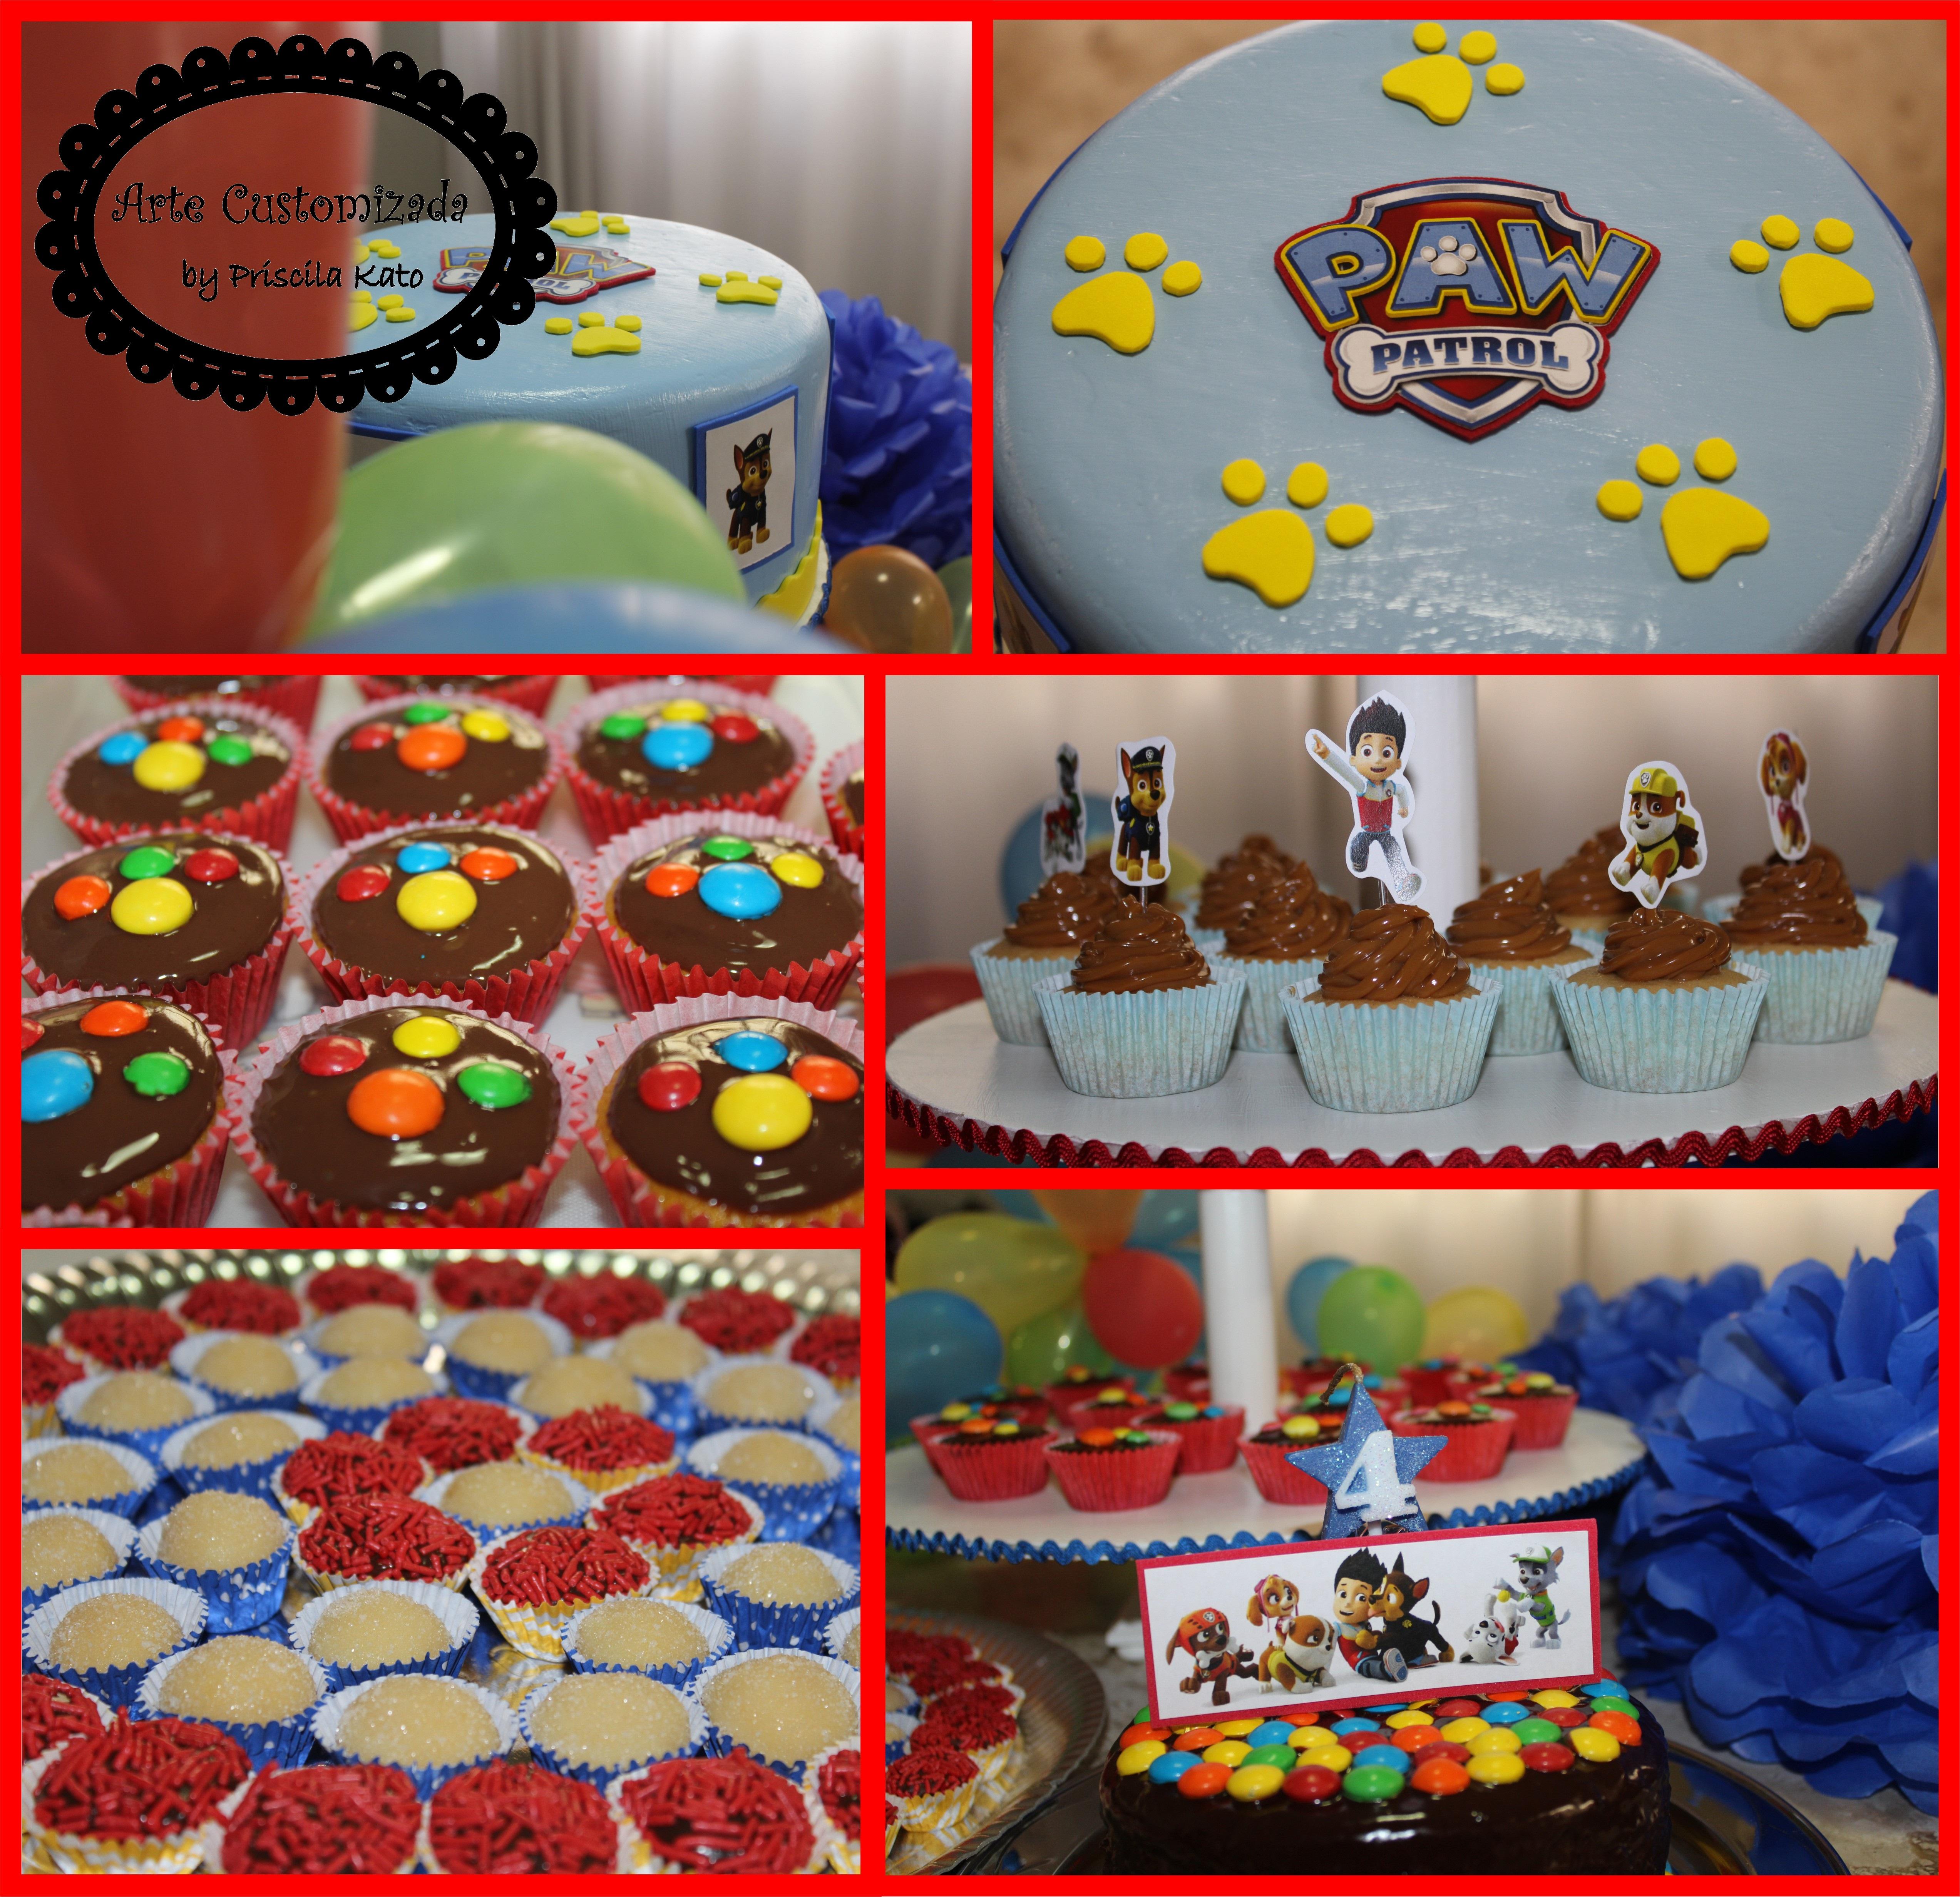 decoracao festa infantil patrulha canina : decoracao festa infantil patrulha canina:bolo-cenografico-patrulha-canina-patrulha-canina